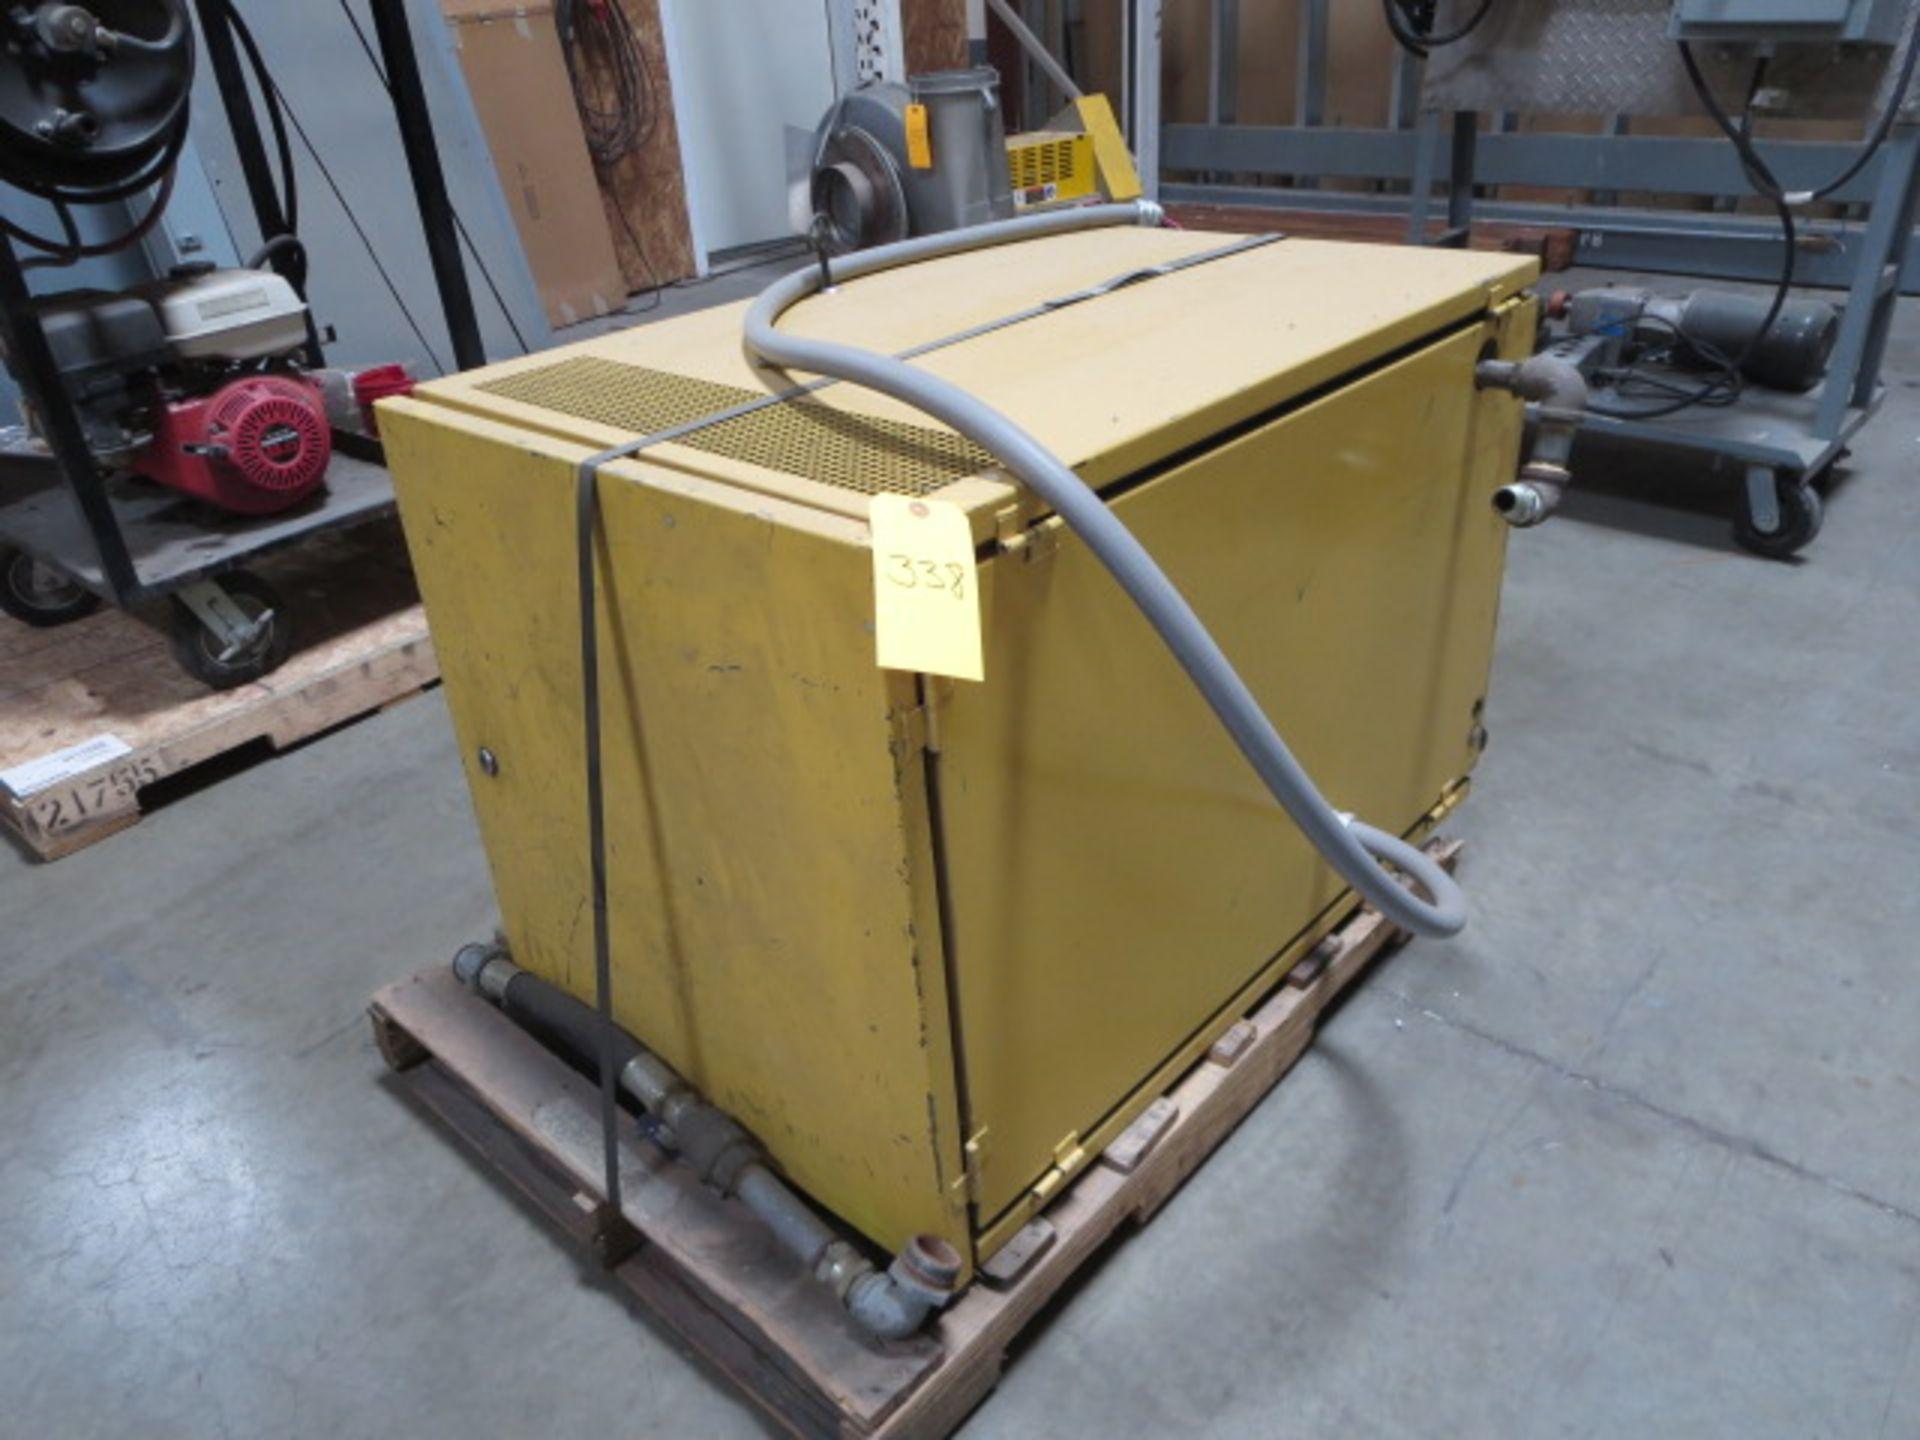 Lot 338 - Kaeser Compressor, 187Hrs